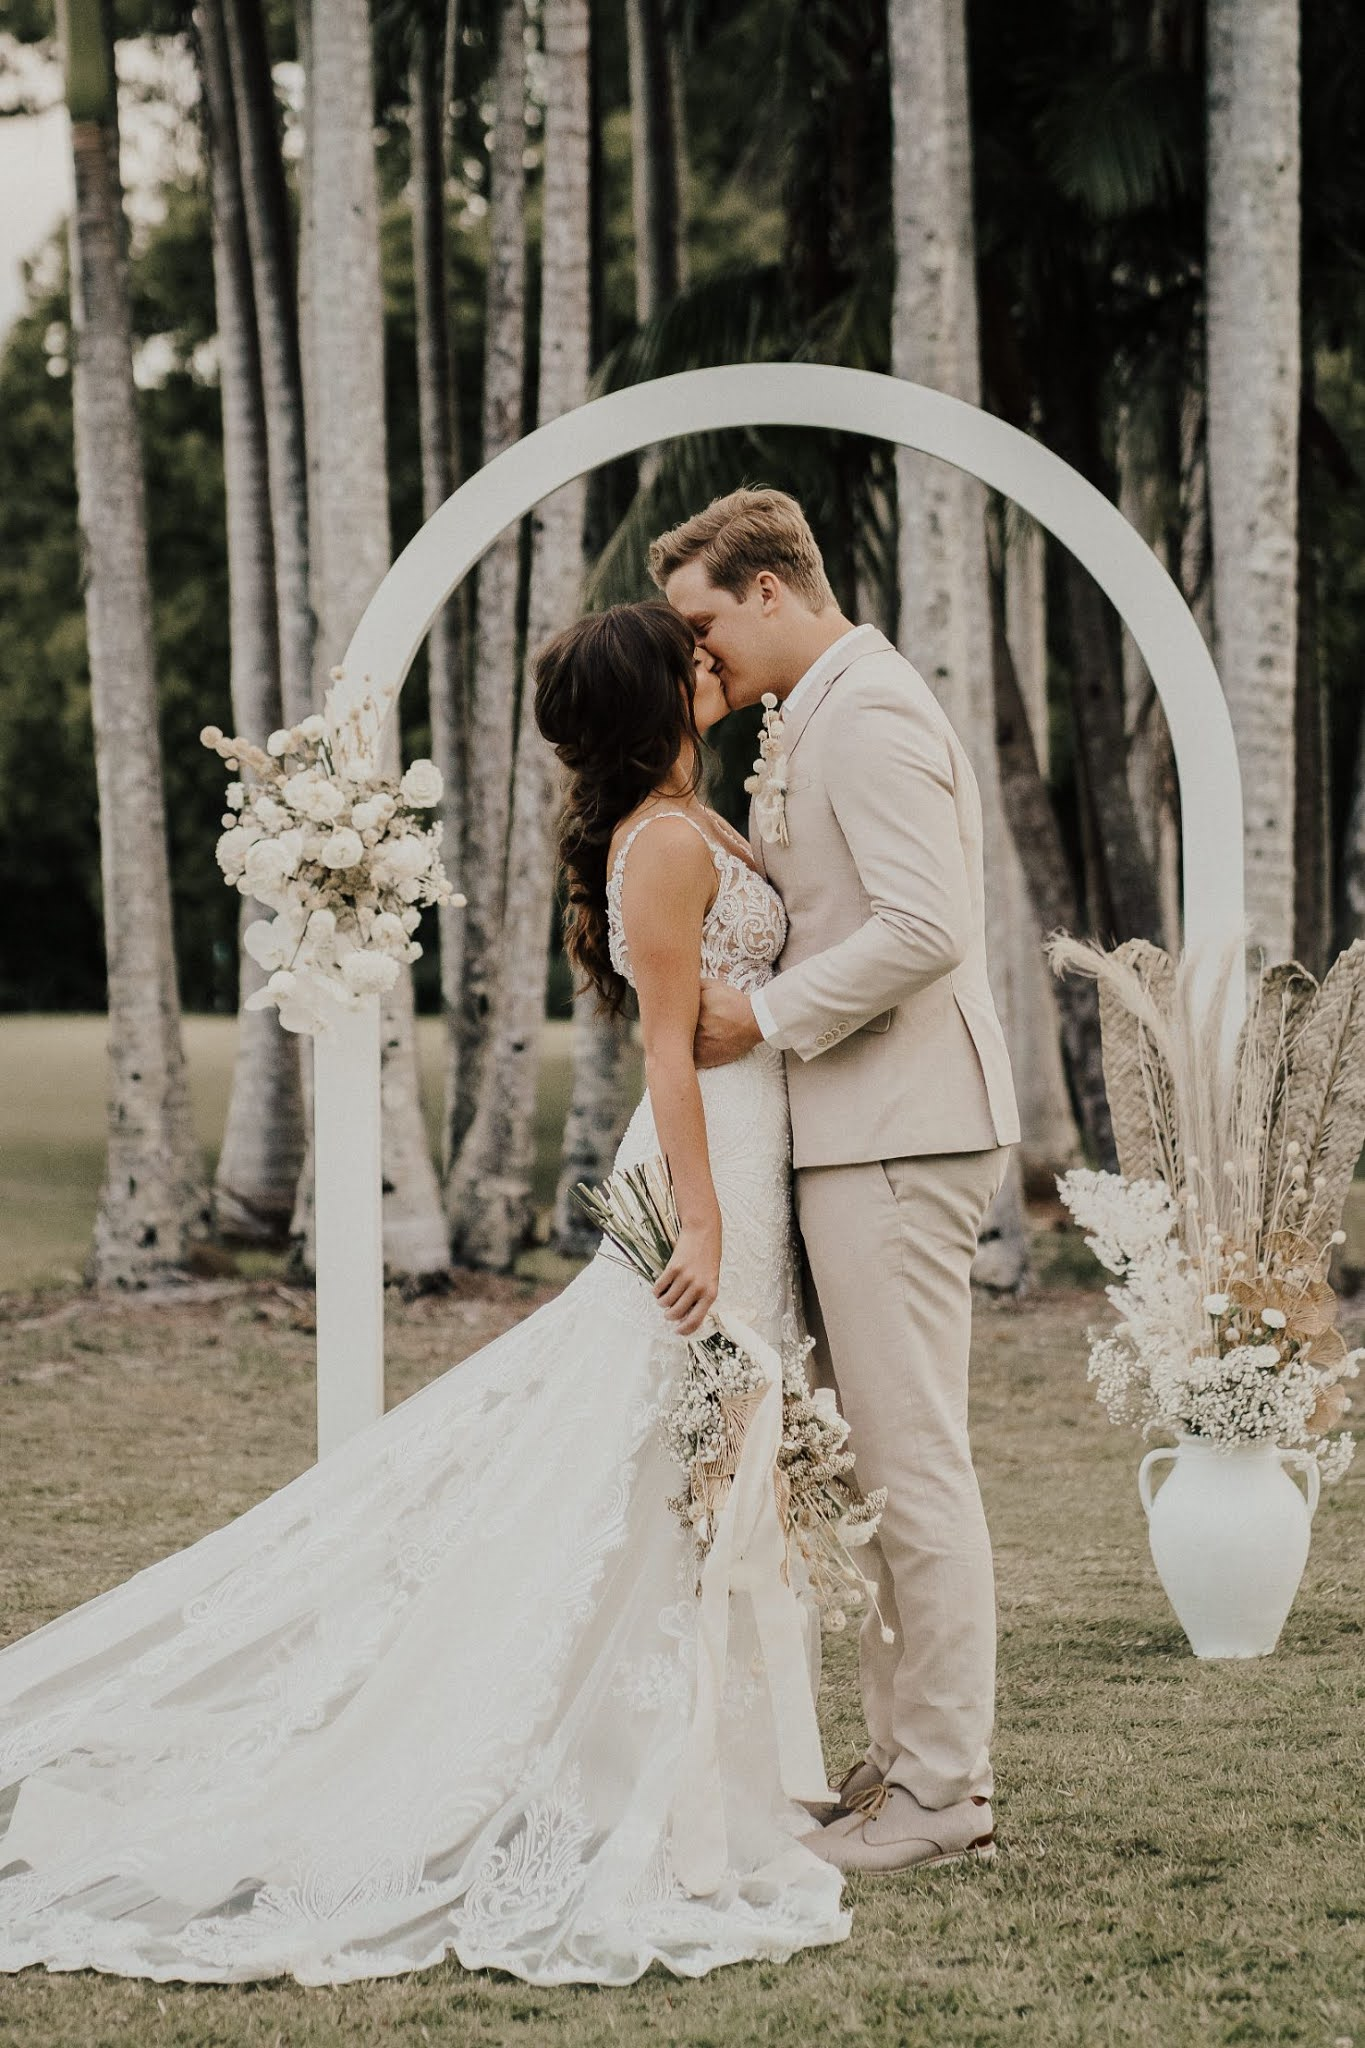 SOFT BOHO WEDDING ELEGANCE SHOOT